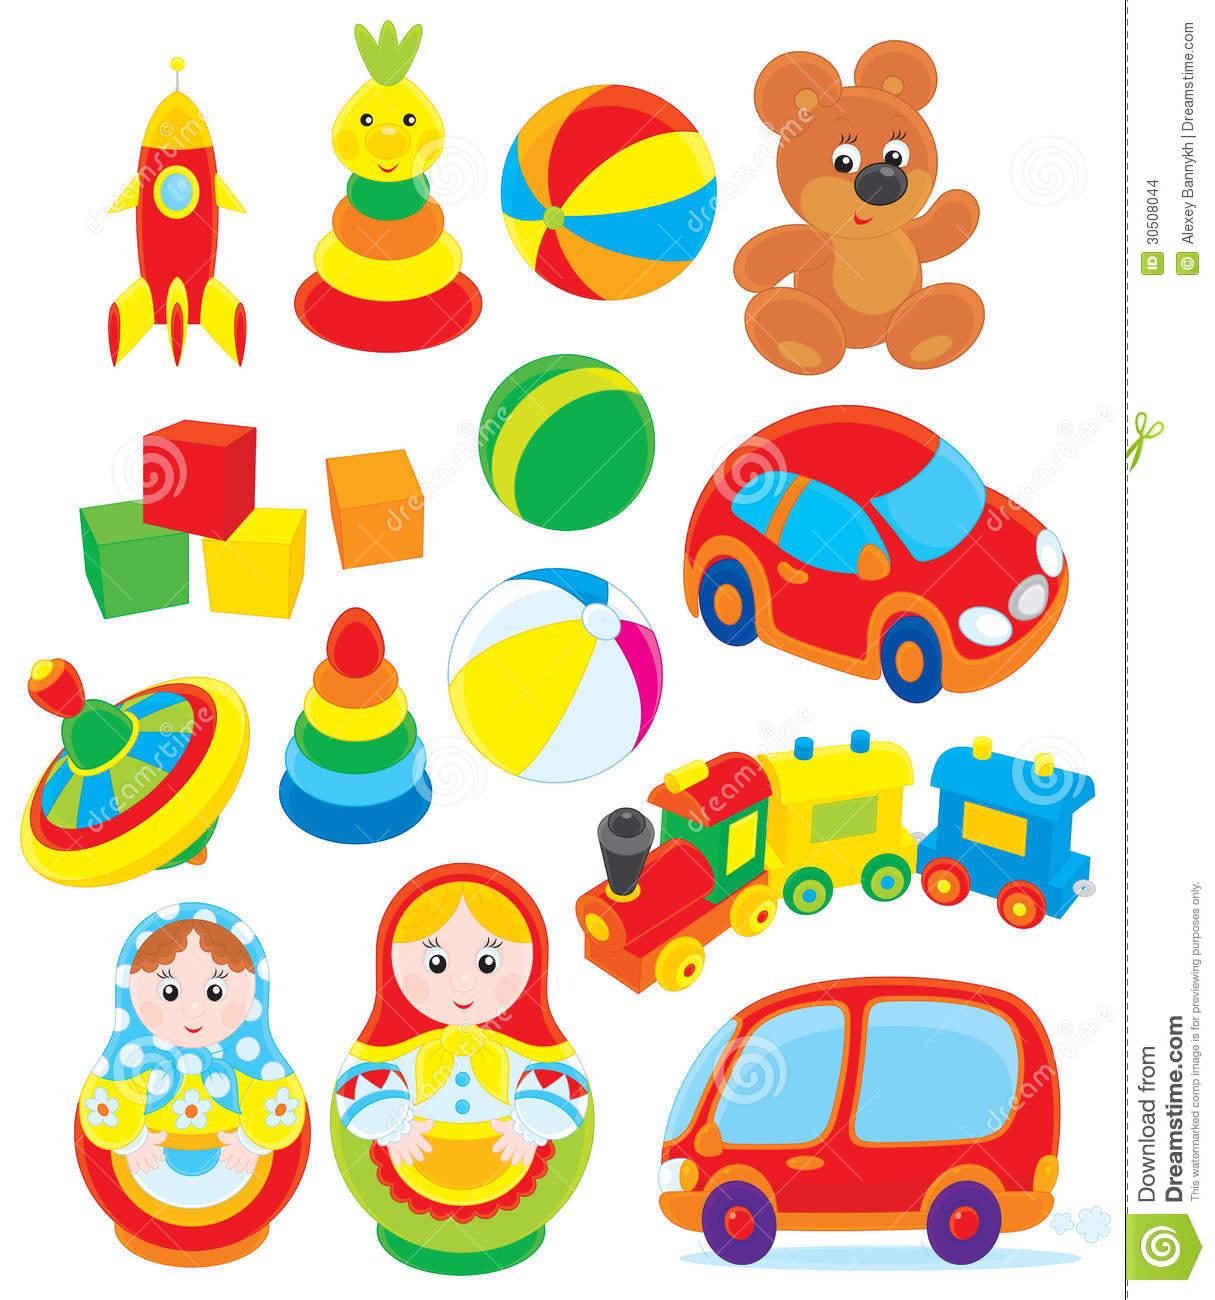 Toys clipart #16